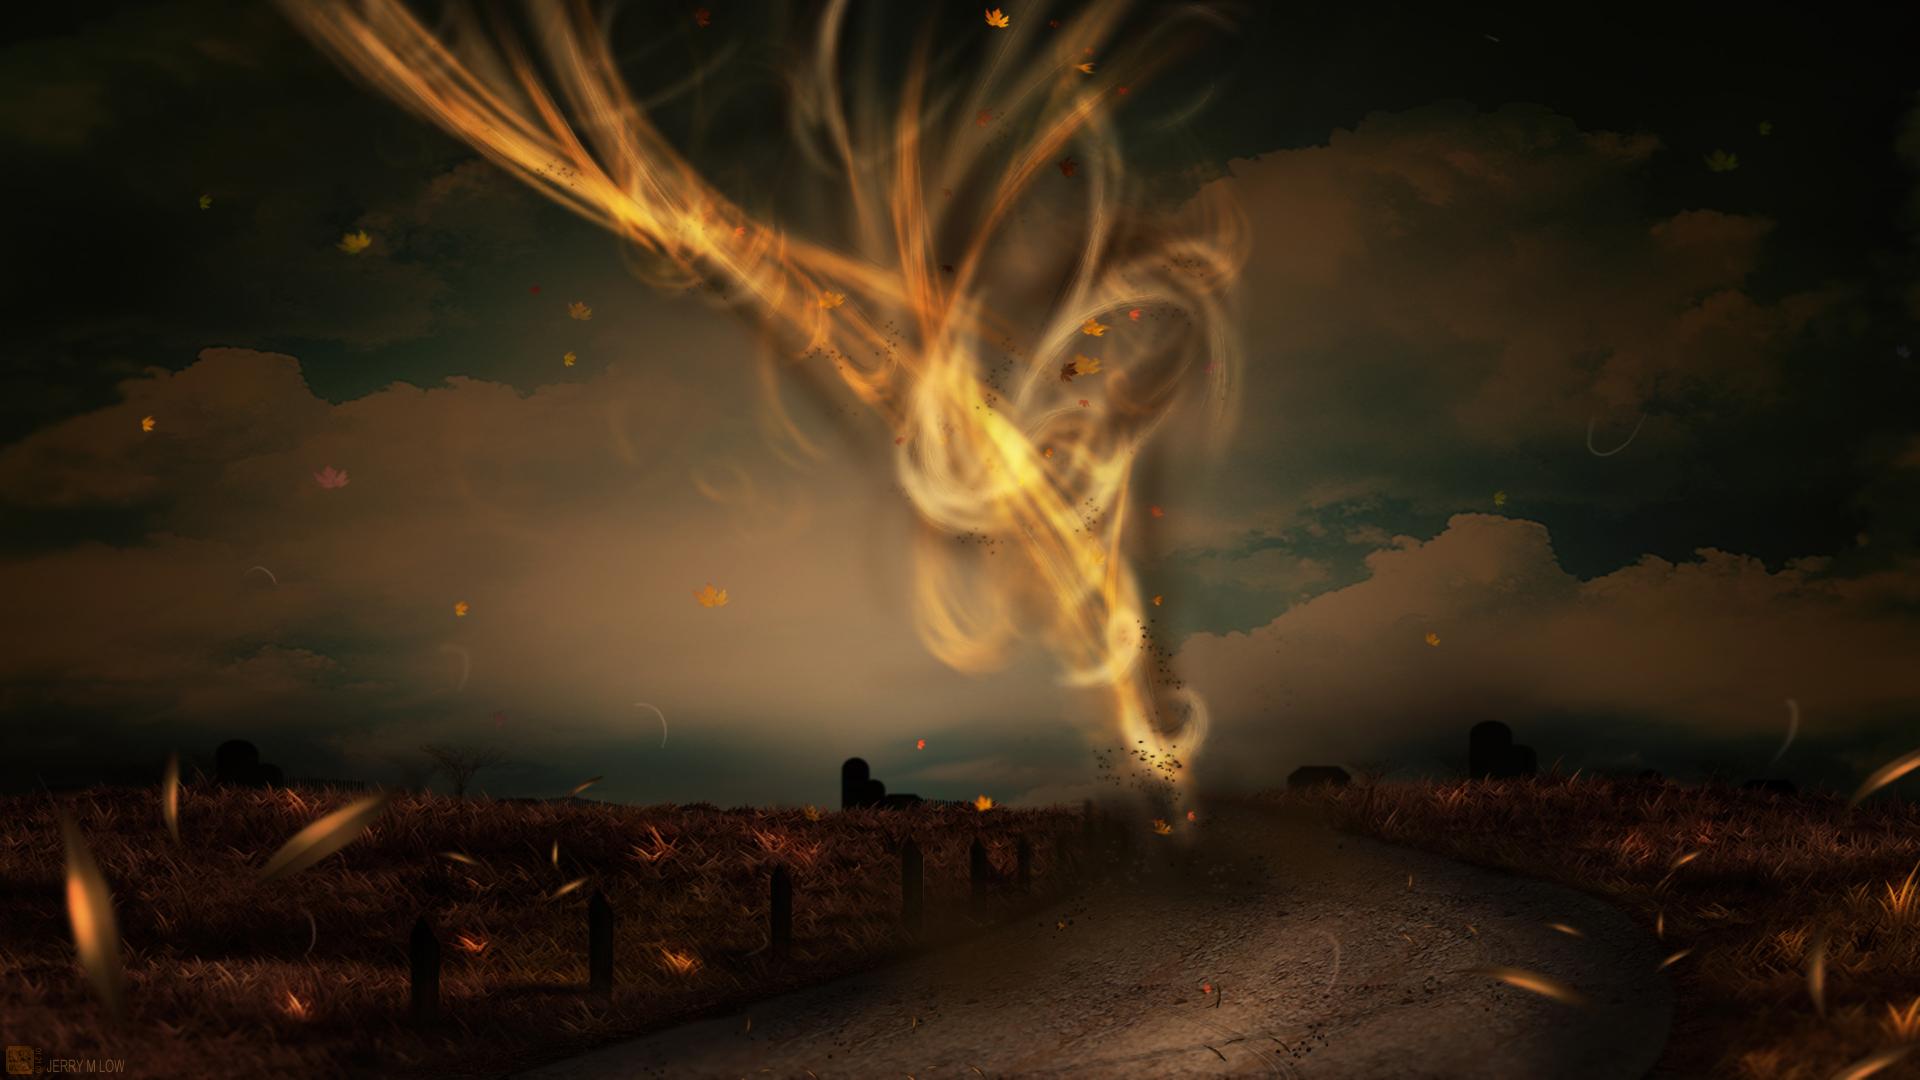 mystical_tornado_1920x1080